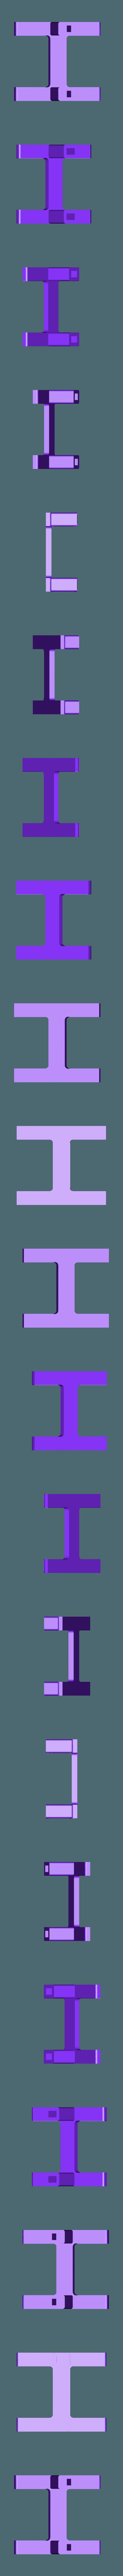 LPT3K_ladder_base.stl Download free STL file Ladder Peg Toy 3000: Codename Overkill • 3D printing object, ecoiras